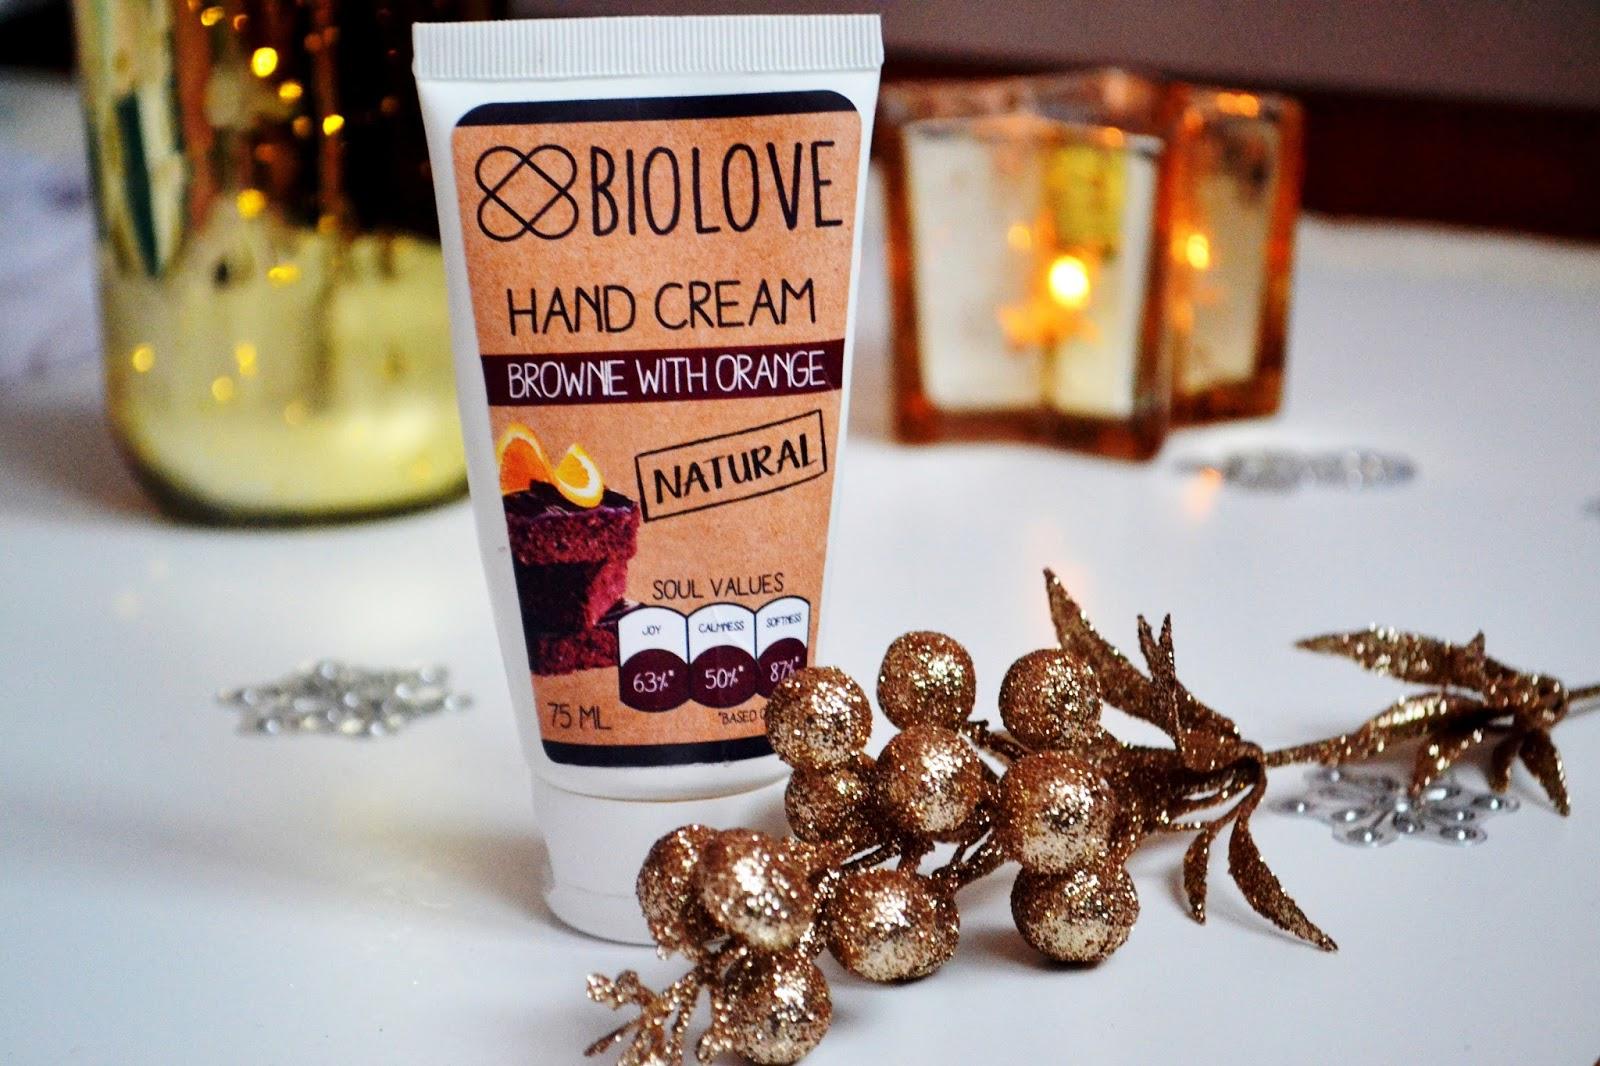 kontigo naturalne kosmetyki biolove opinie krem do rąk brownie z pomarańczą